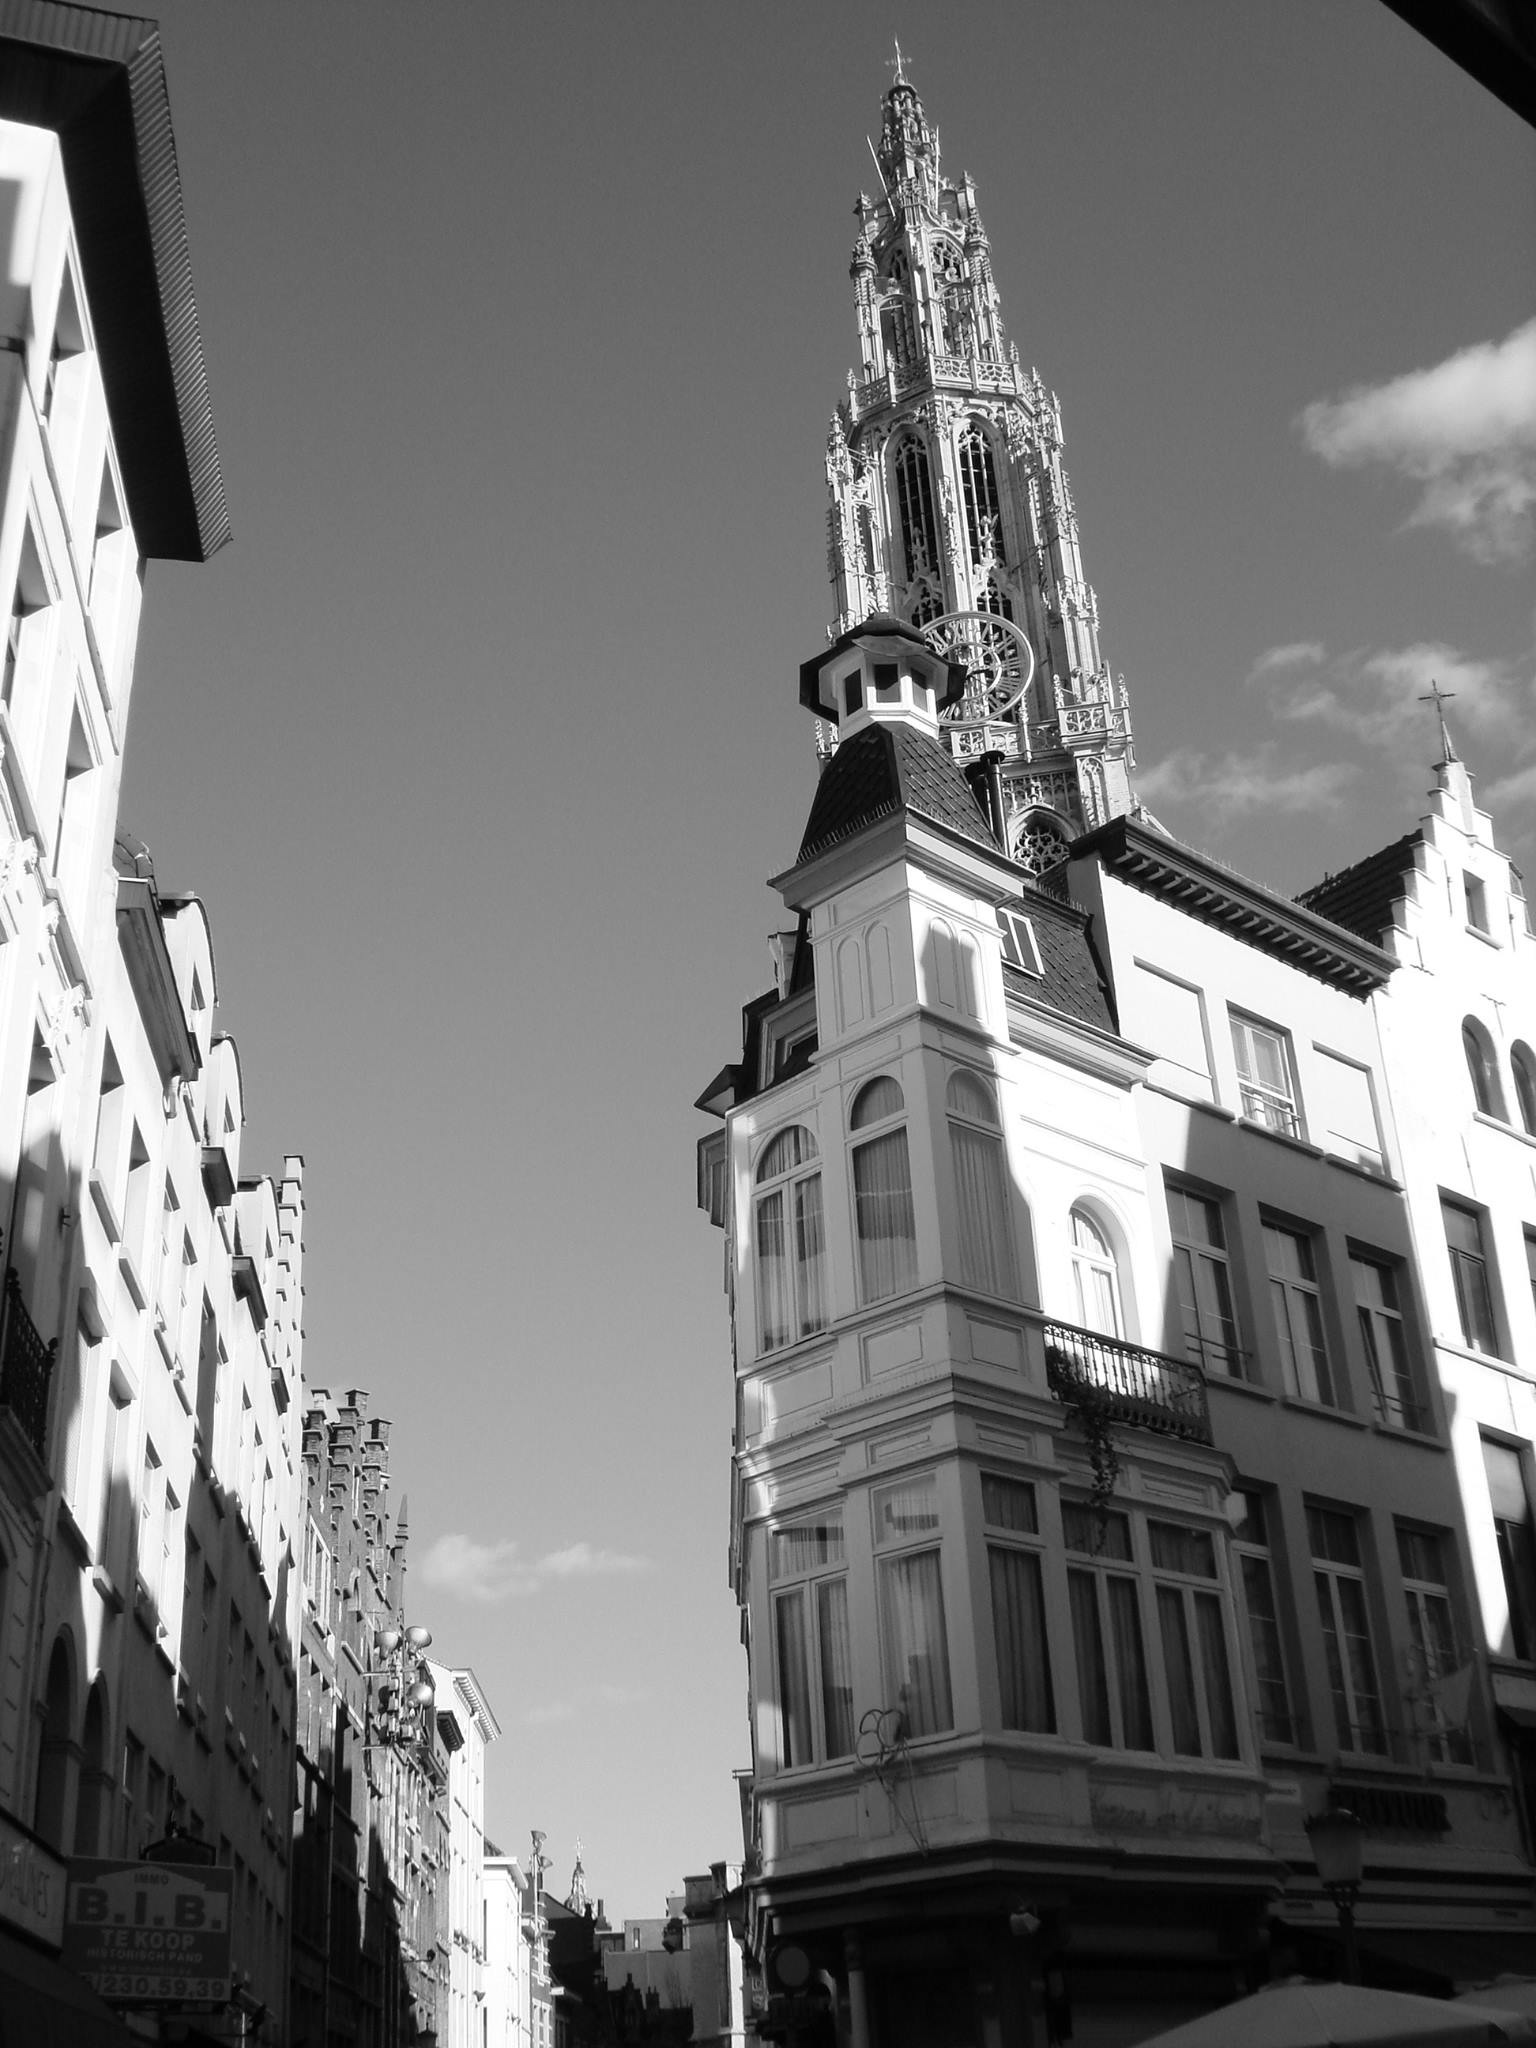 Antwerp, Belgium the omnipresent tower by Rosario Di Rubbo